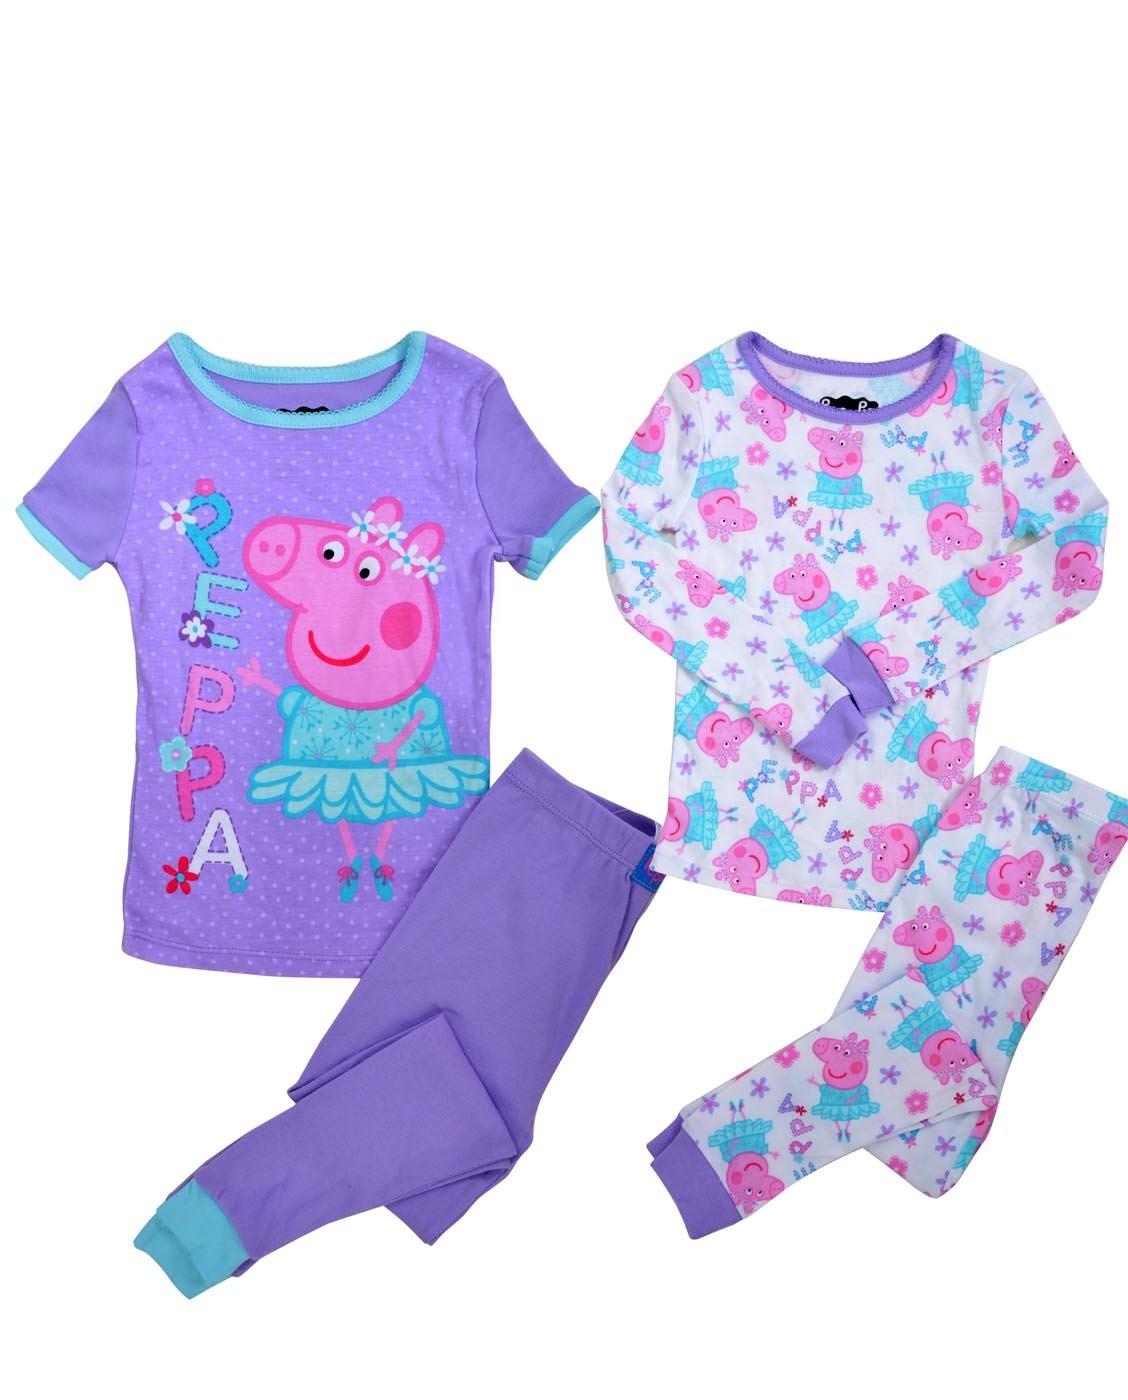 Peppa Pig Toddler Girls' Ballerina 4 Piece Cotton Pajama Set, Purple, 4T